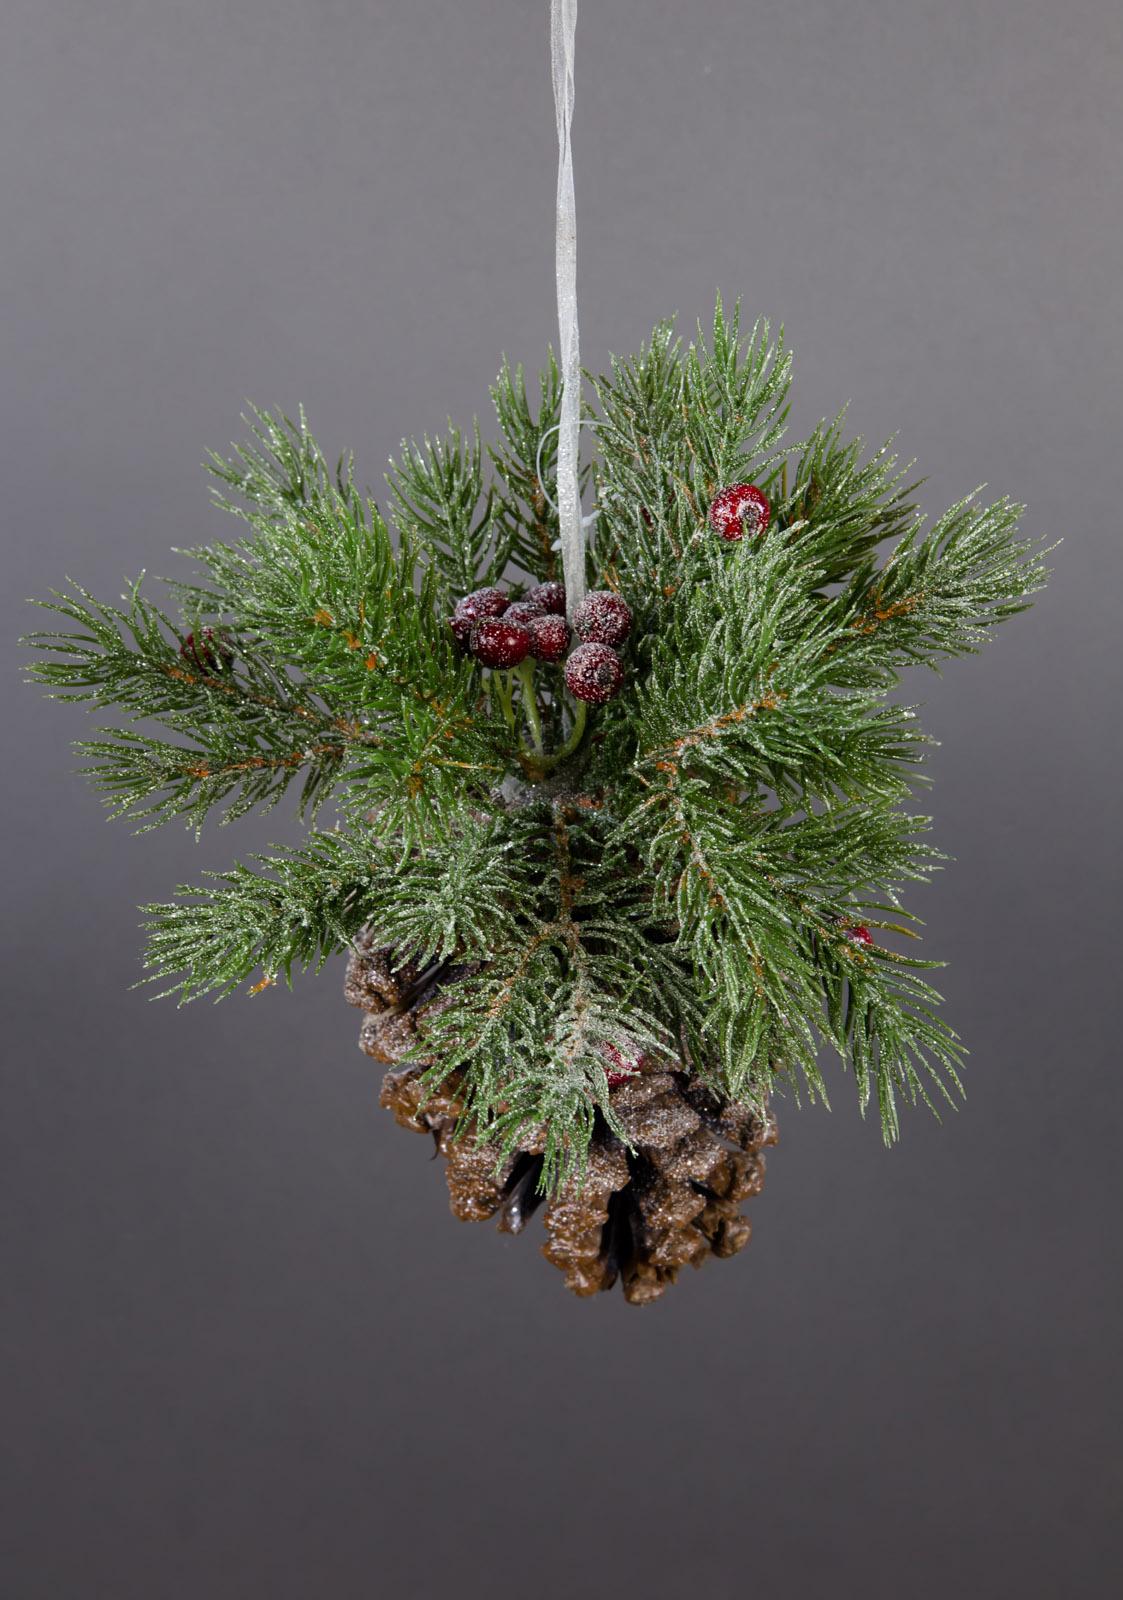 tannenzapfen mit deko rote beeren zum h ngen 24cm dp kunstpflanzen kunstblumen ebay. Black Bedroom Furniture Sets. Home Design Ideas